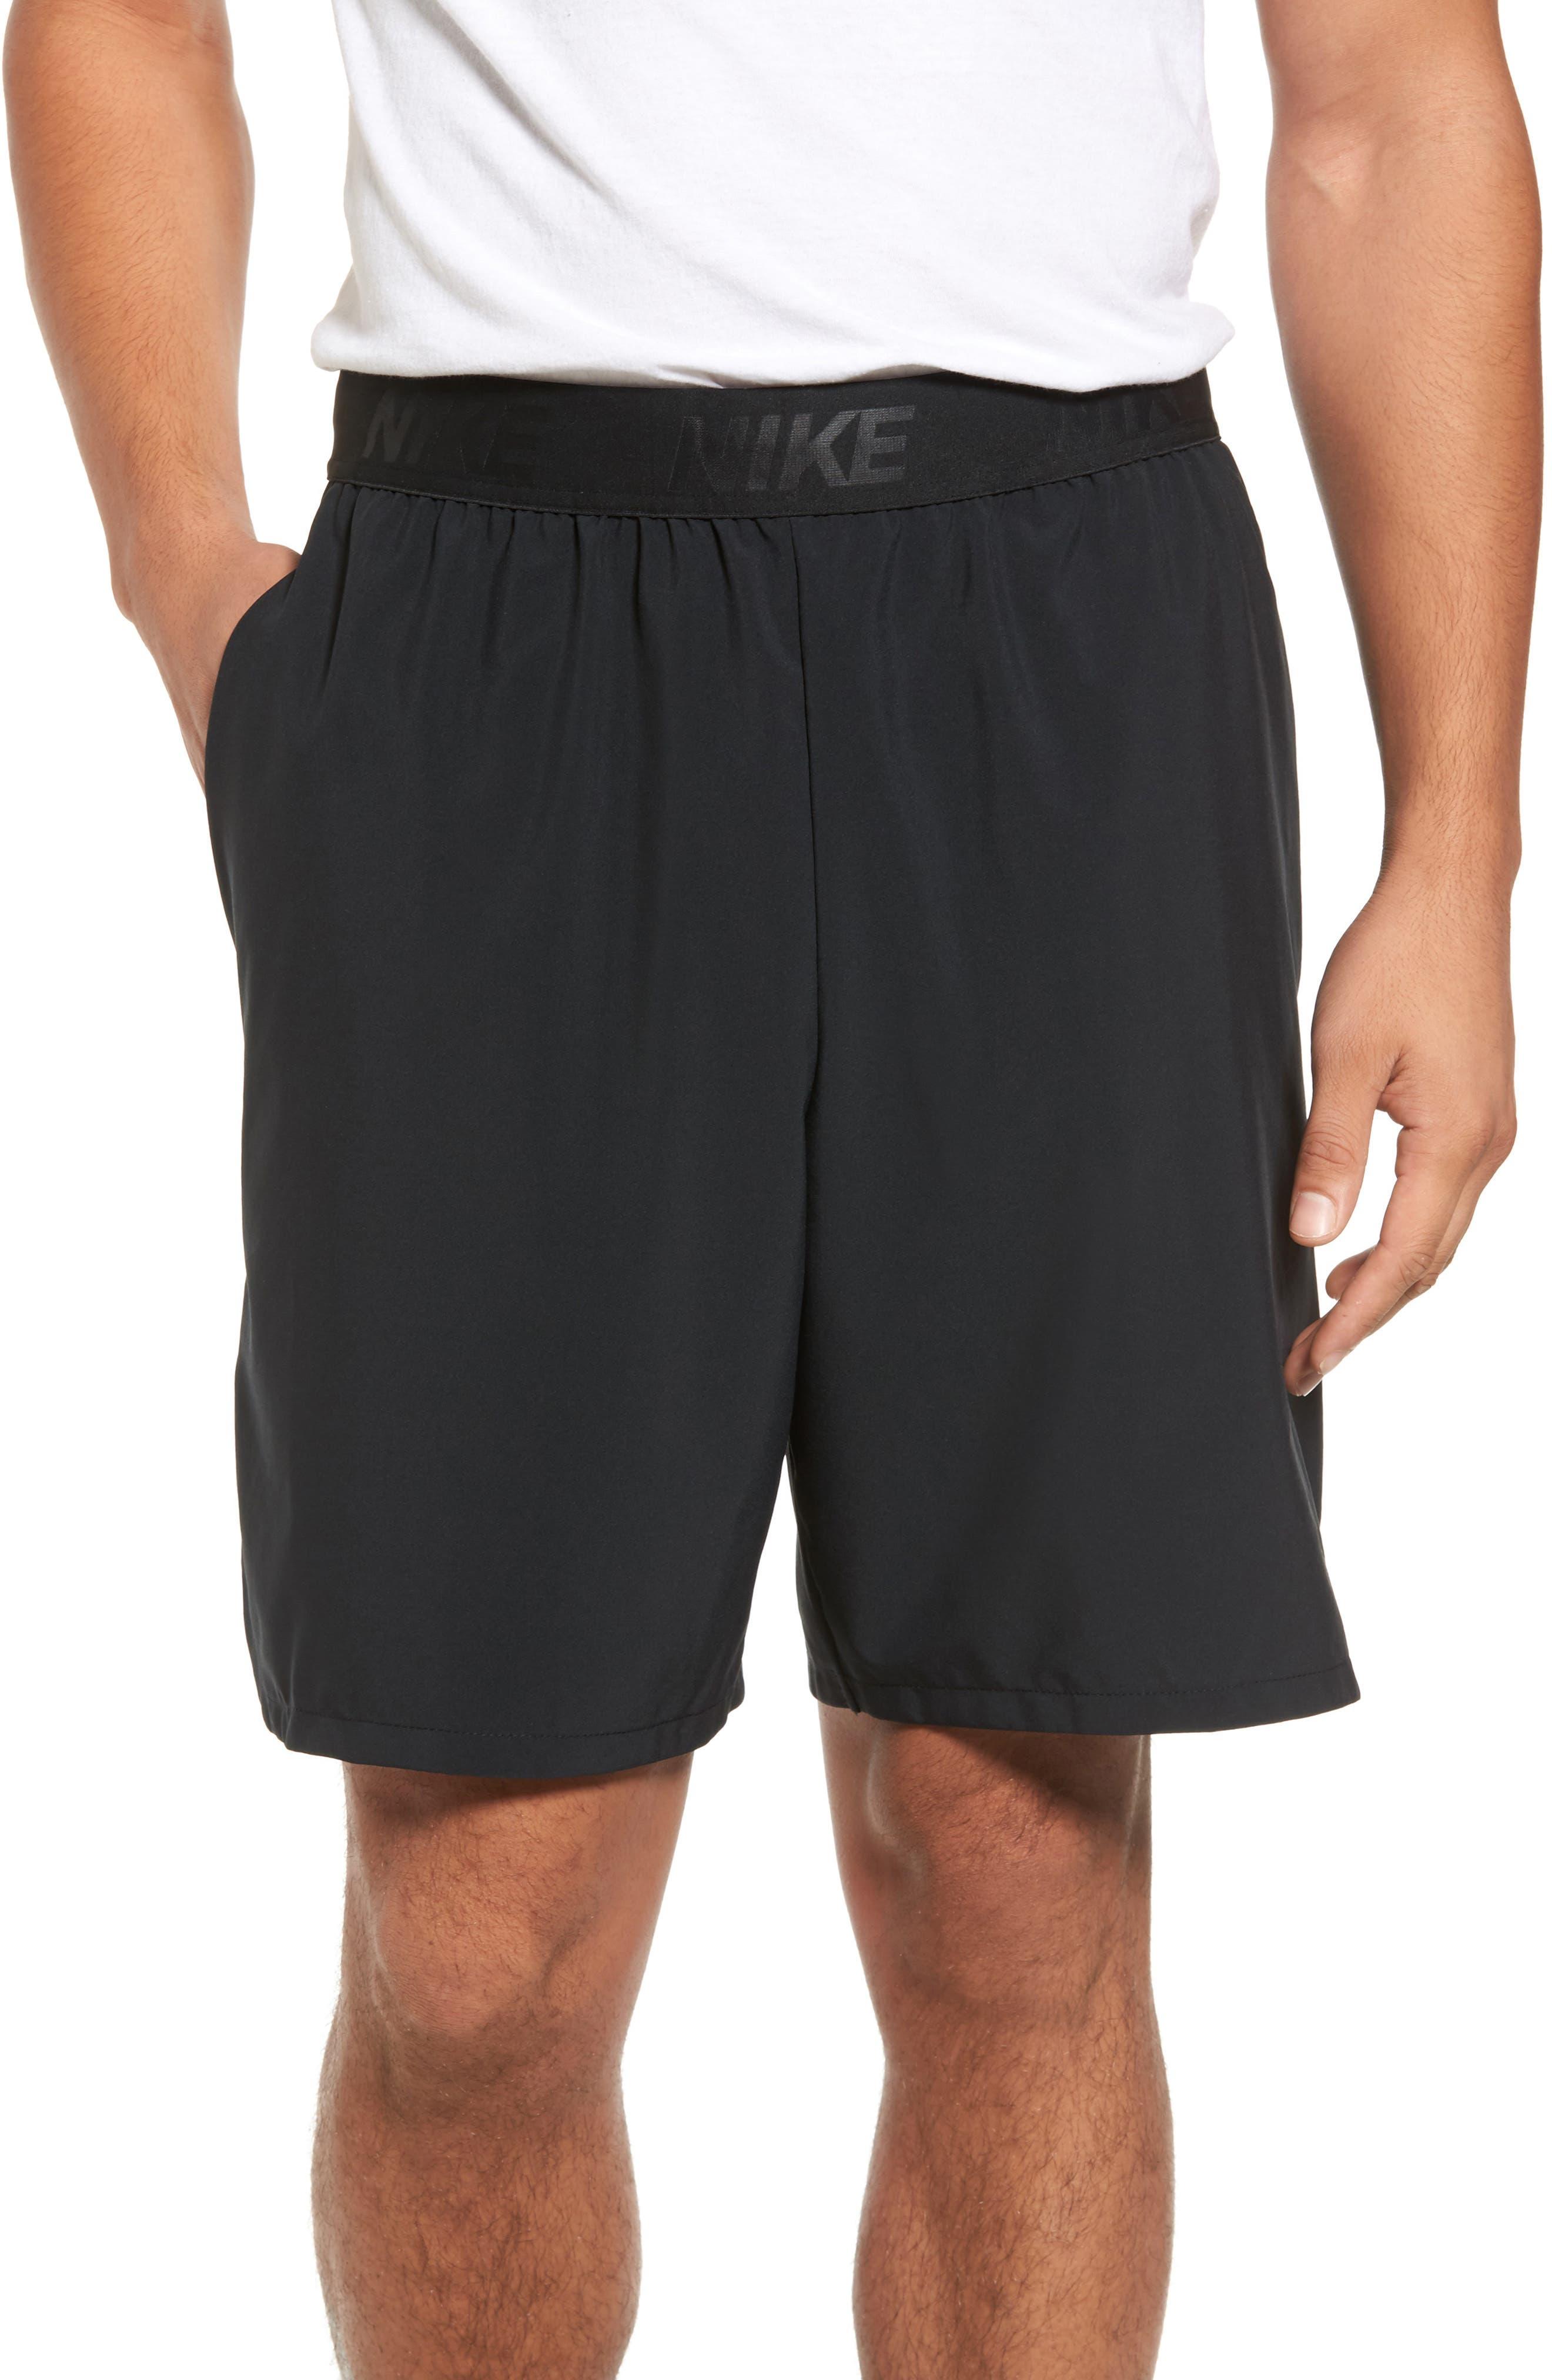 NIKE Flex Vent Max Shorts, Main, color, BLACK/ METALLIC HEMATITE